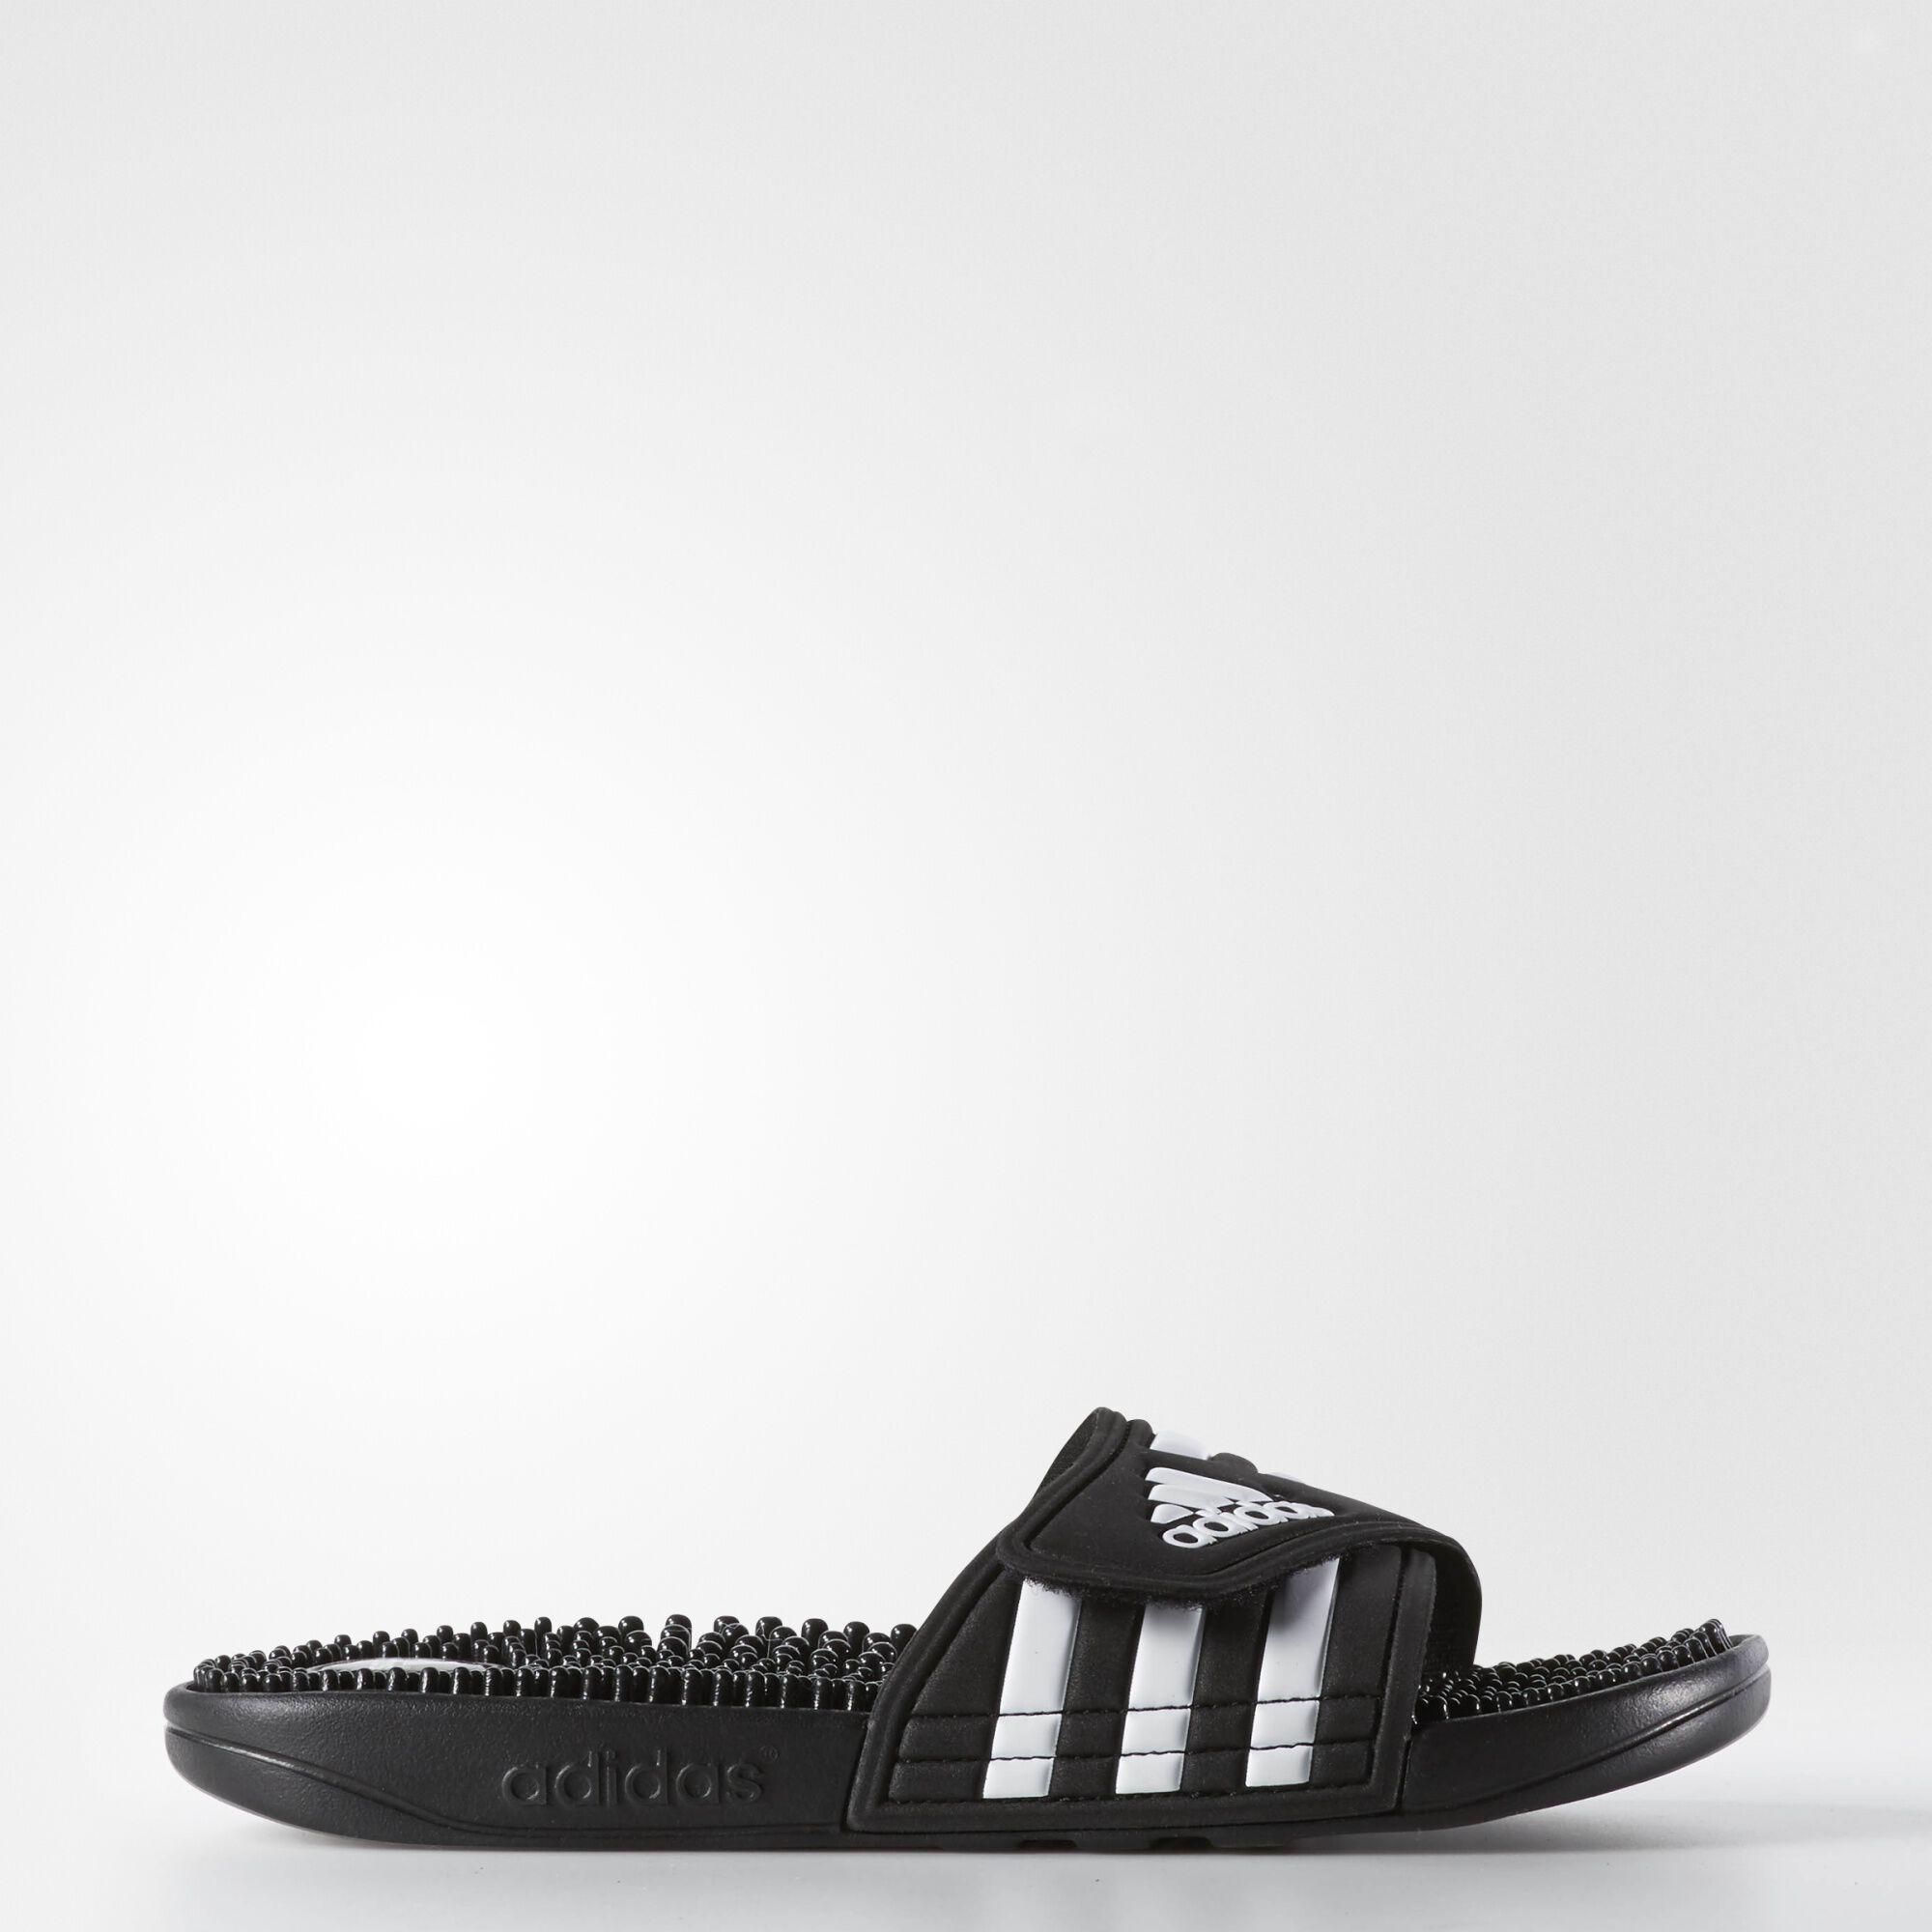 d39022217682 ... adidas - Adissage Slides Black   Black   Running White 087609 adidas  Women s ...